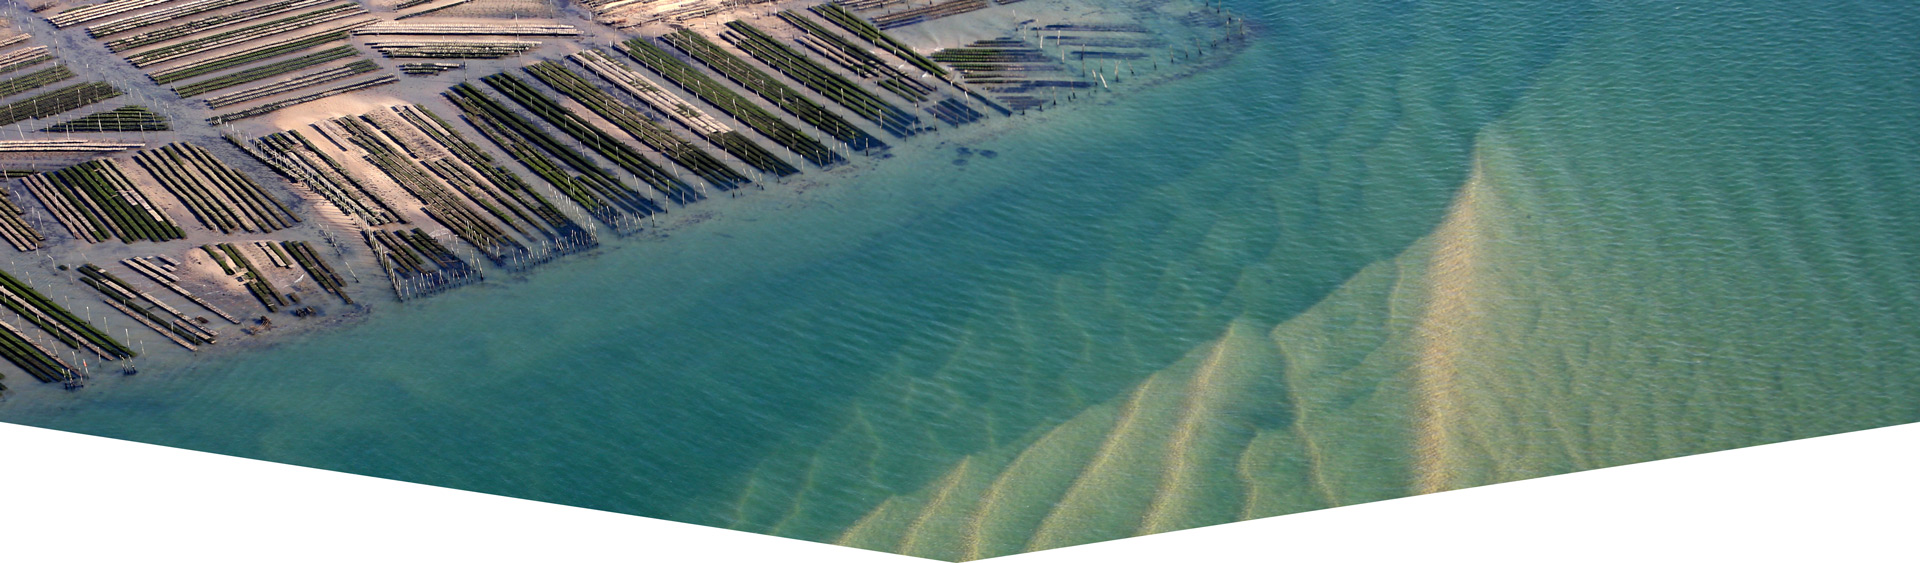 Bassin Arcachon Ecotours seminaire ecolo